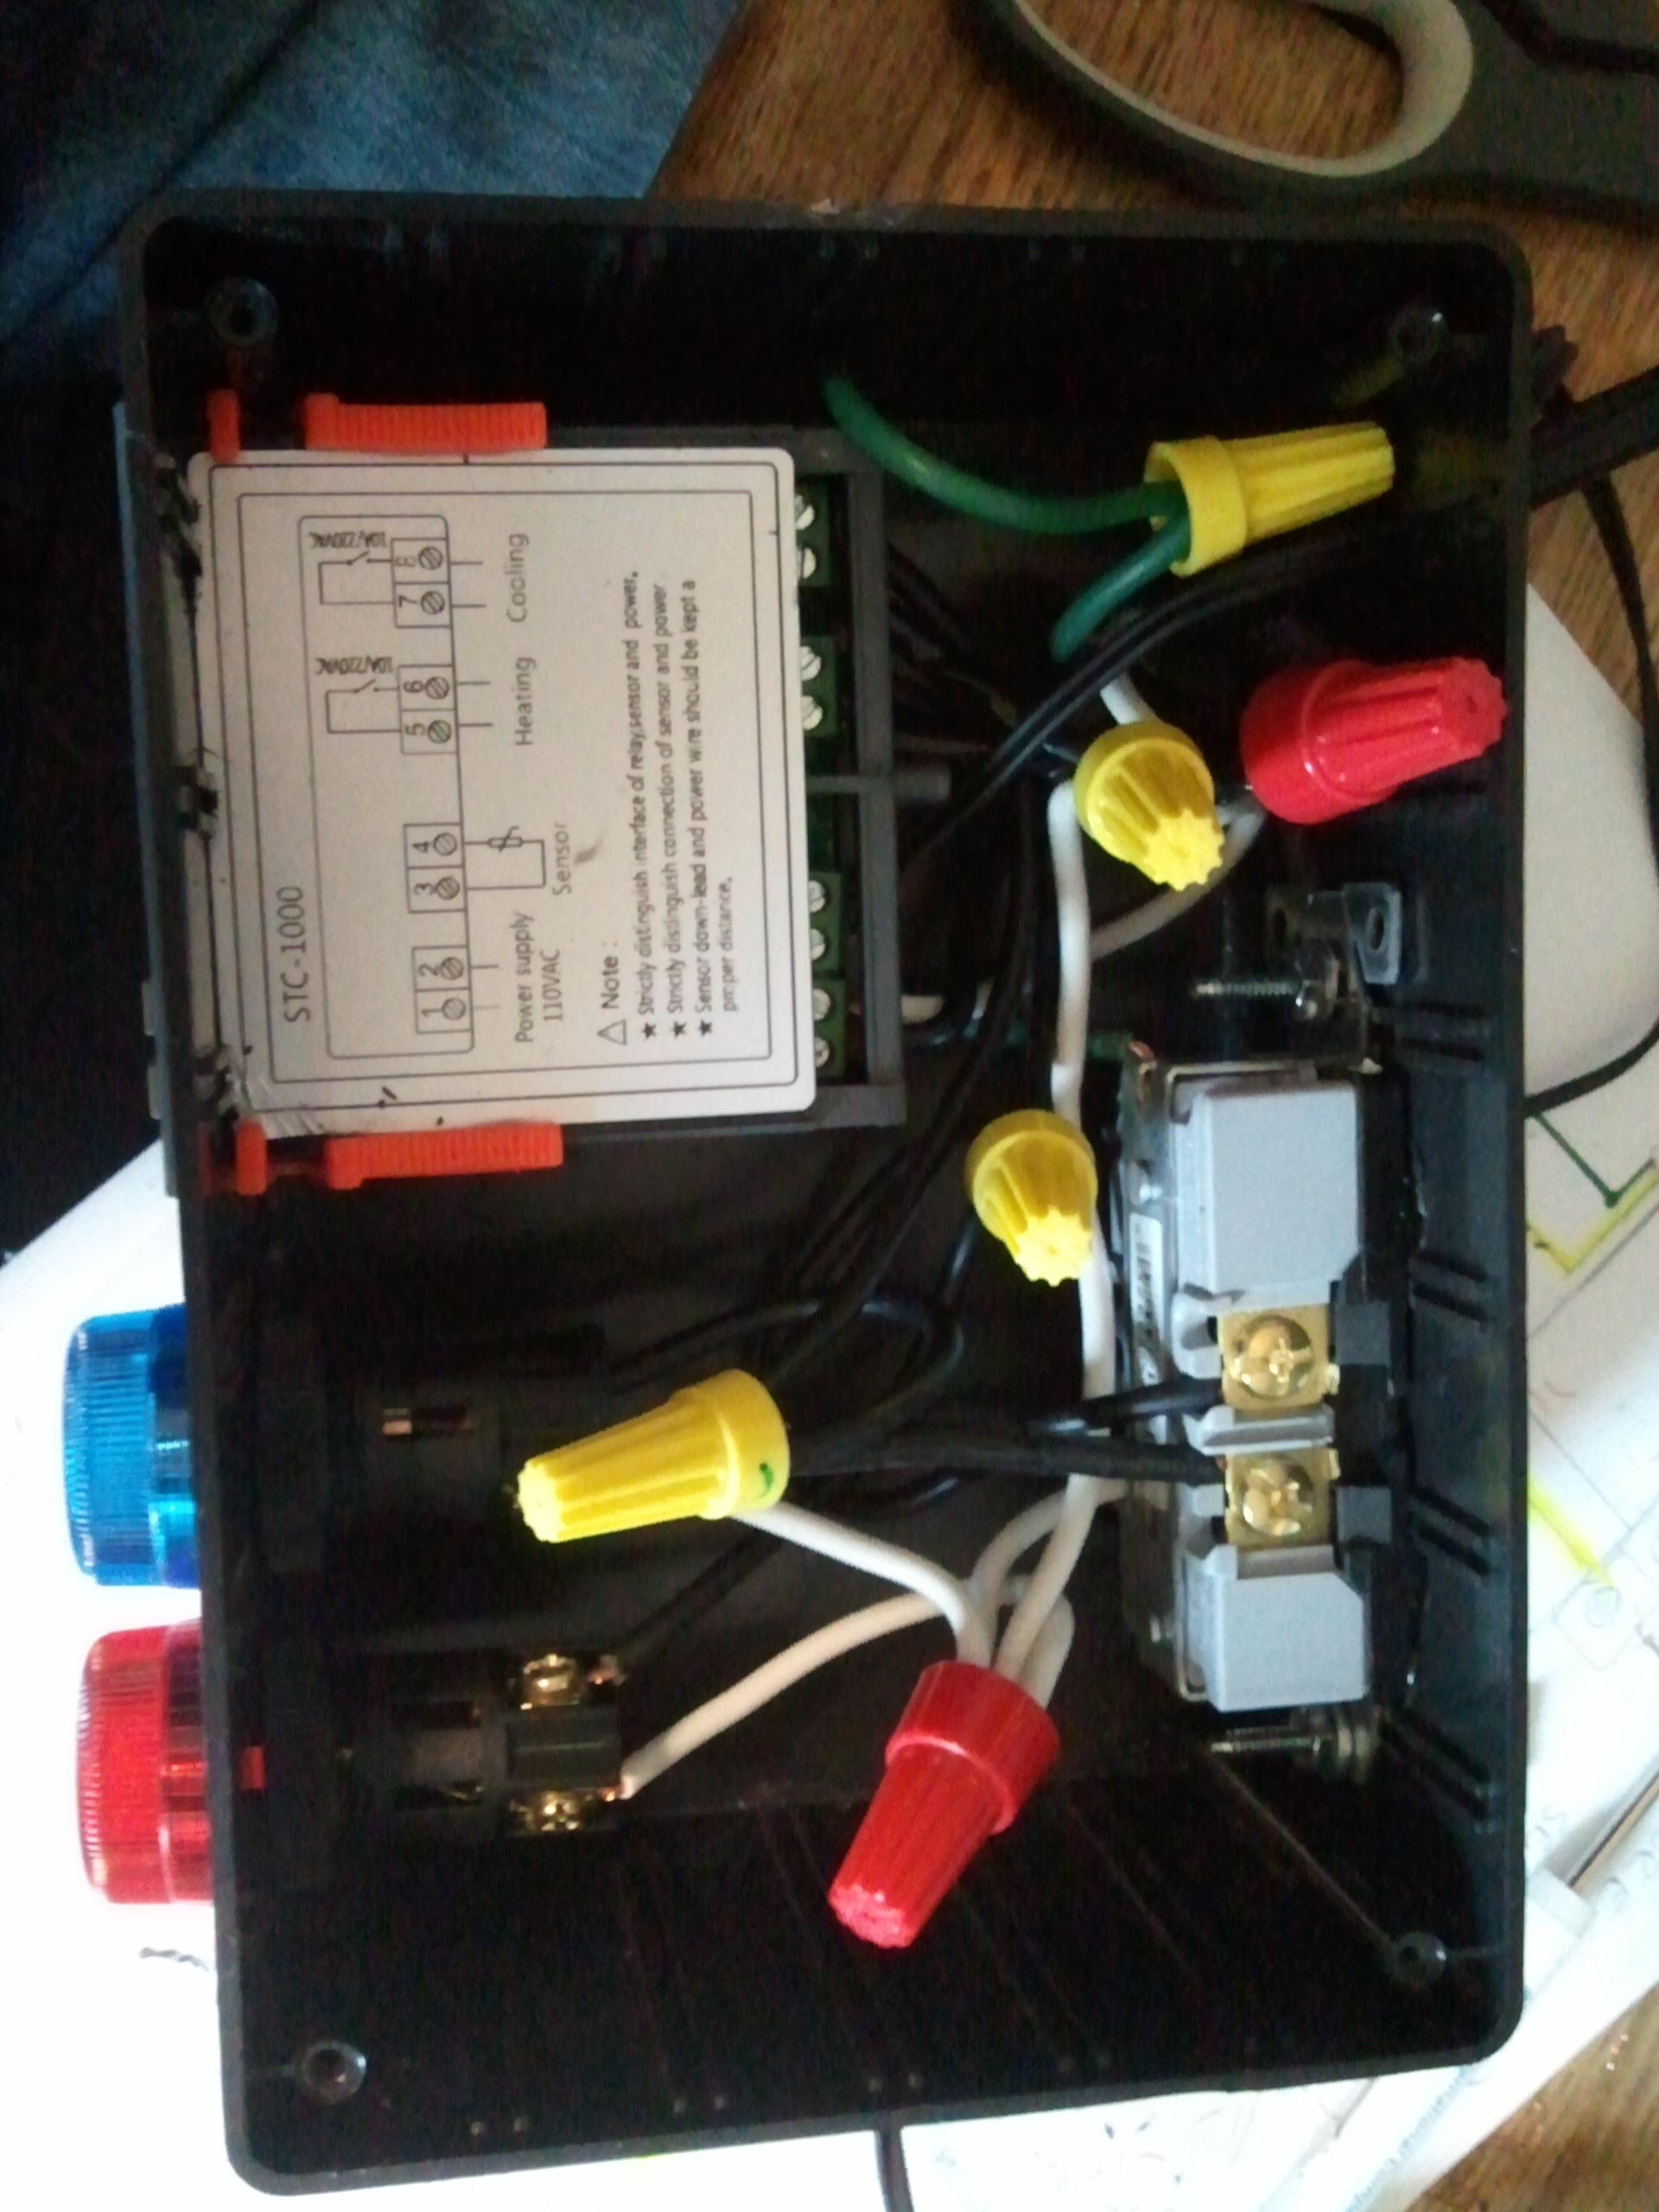 stc 1000 temperature controller wiring light switch receptacle diagram itc f nemetas aufgegabelt info diy 2 stage withdiy